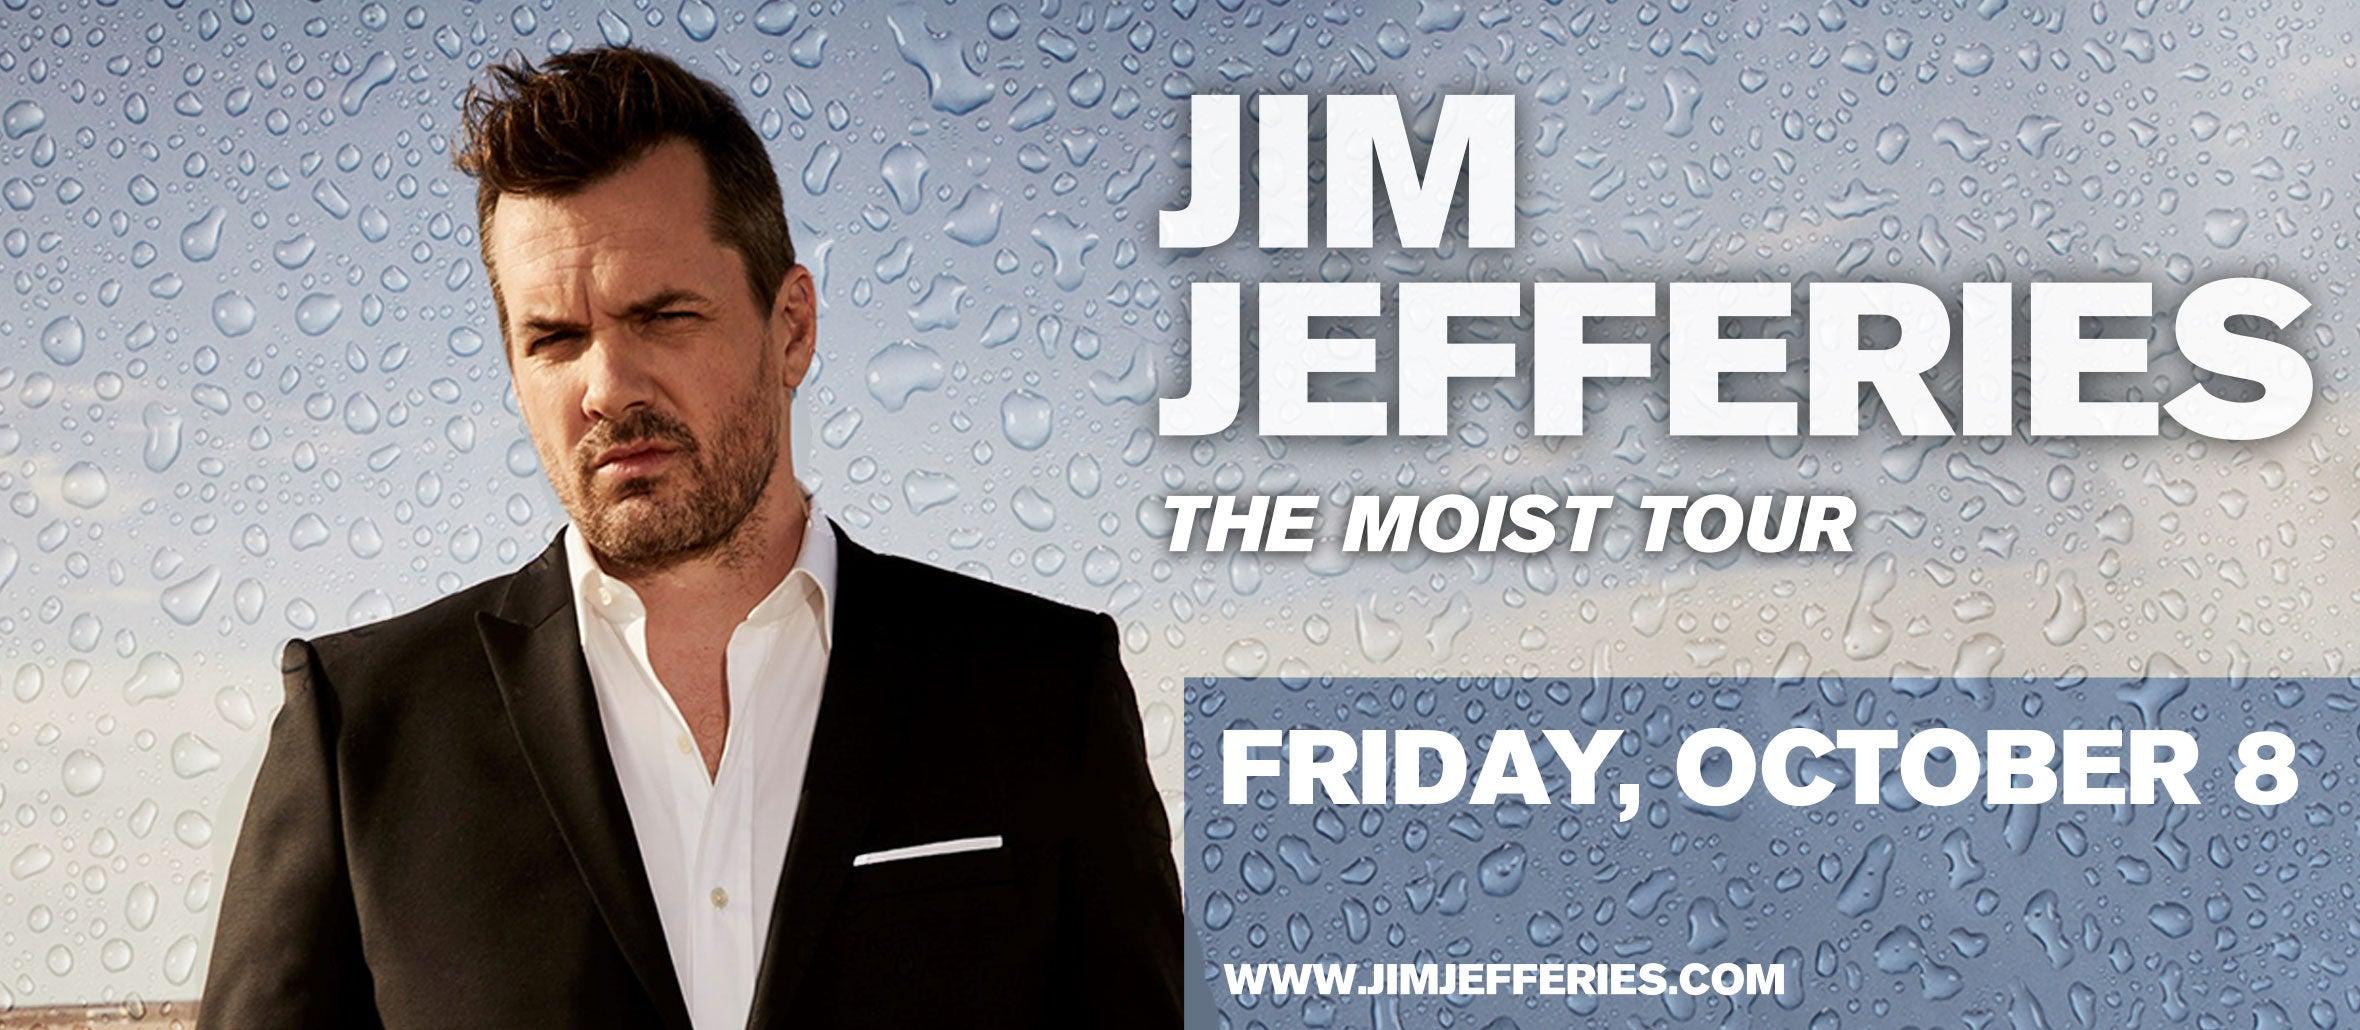 Jim Jefferies: The Moist Tour